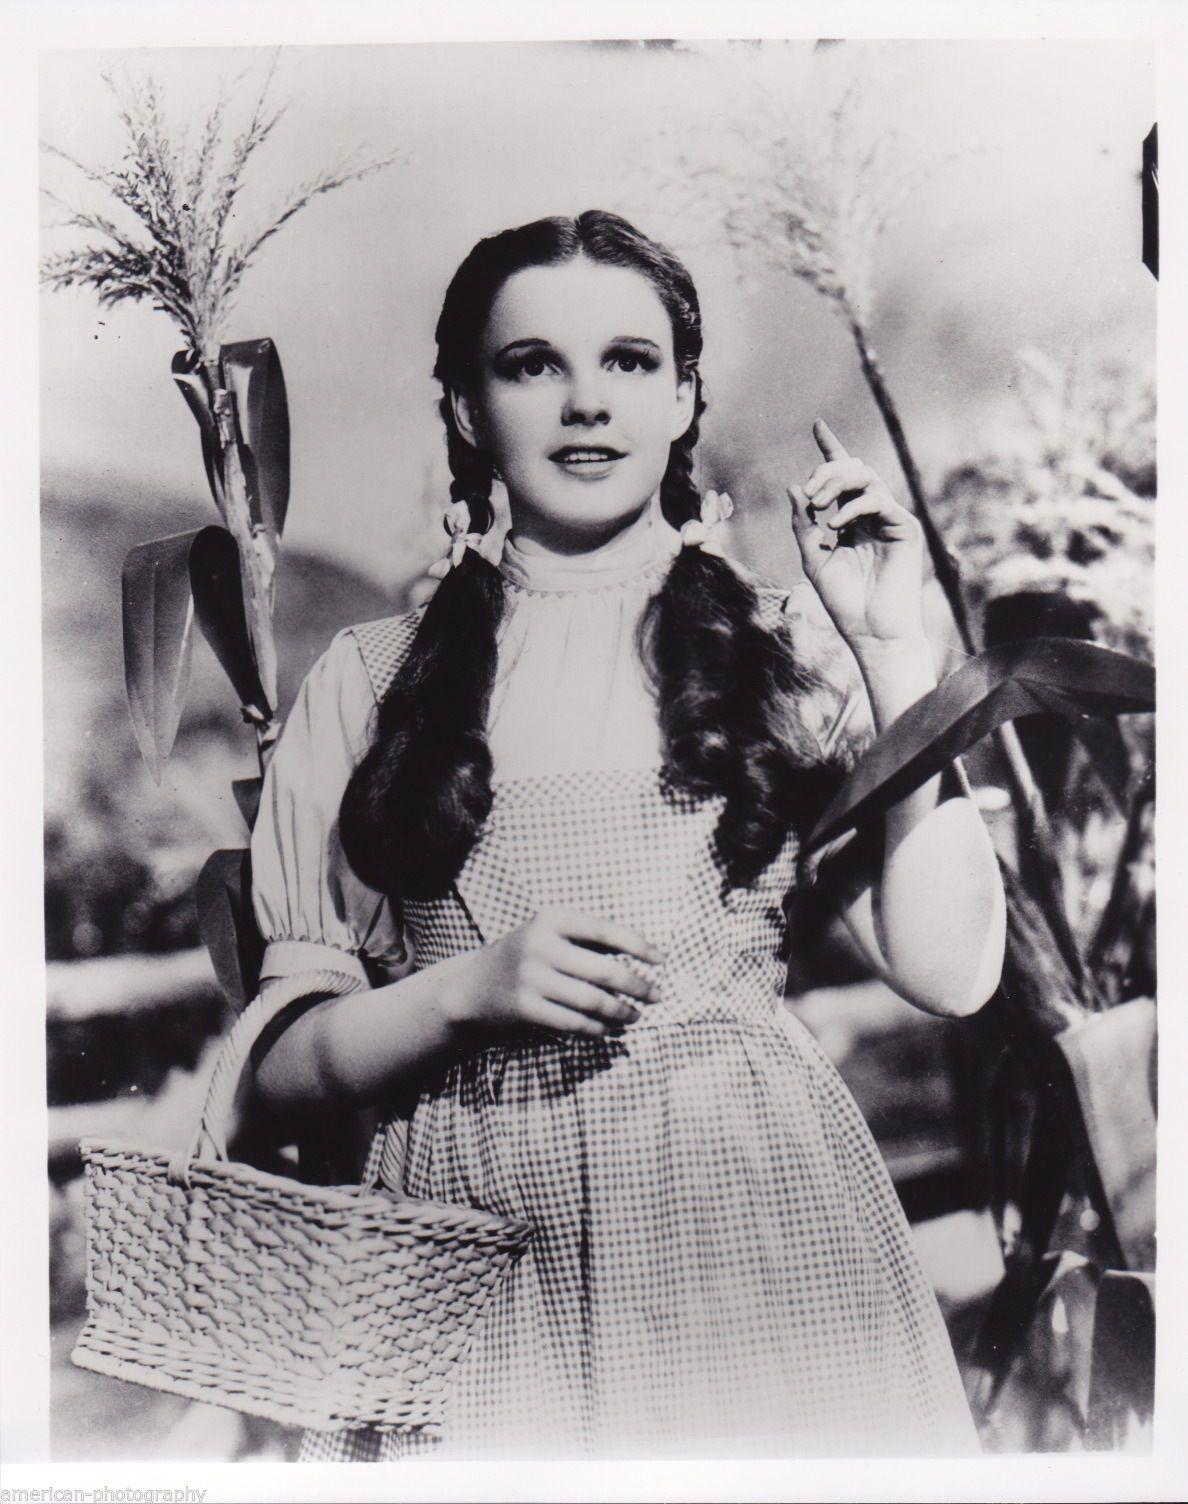 The WIZARD OF OZ - Judy Garland * Metro-Goldwyn-Mayer Studio * L. Frank Baum